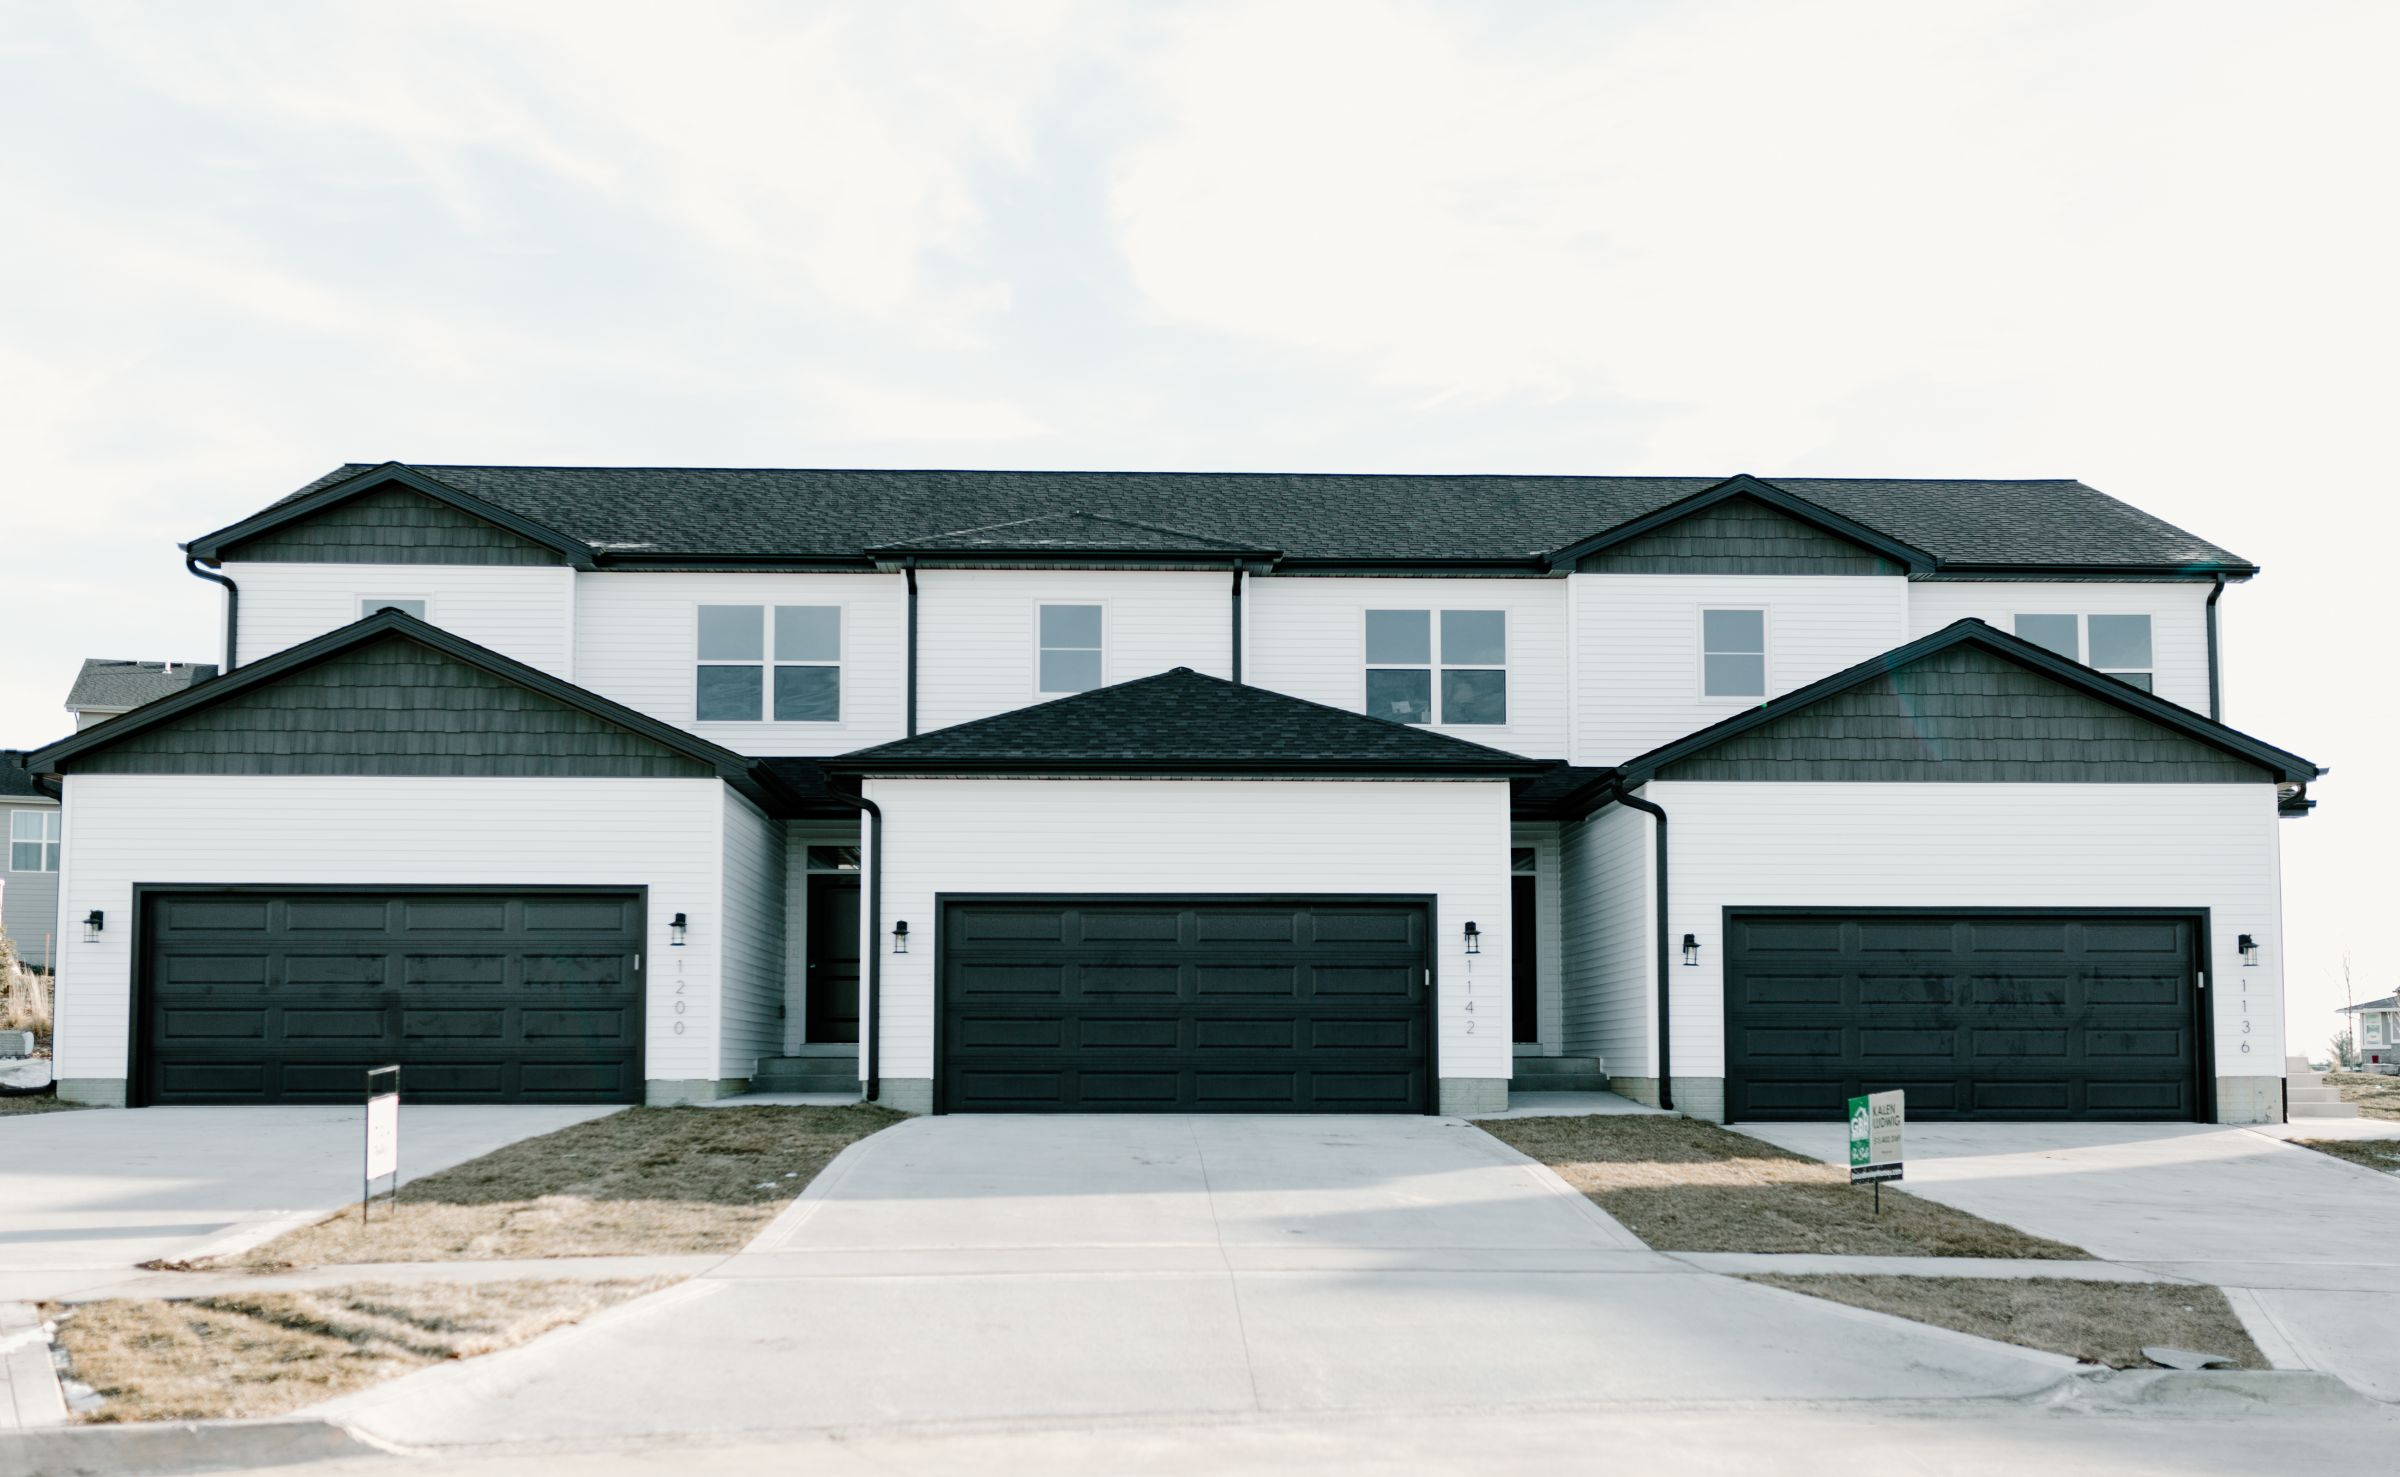 residential-warren-county-iowa-0-acres-listing-number-15140-7-2020-12-28-165304.jpg